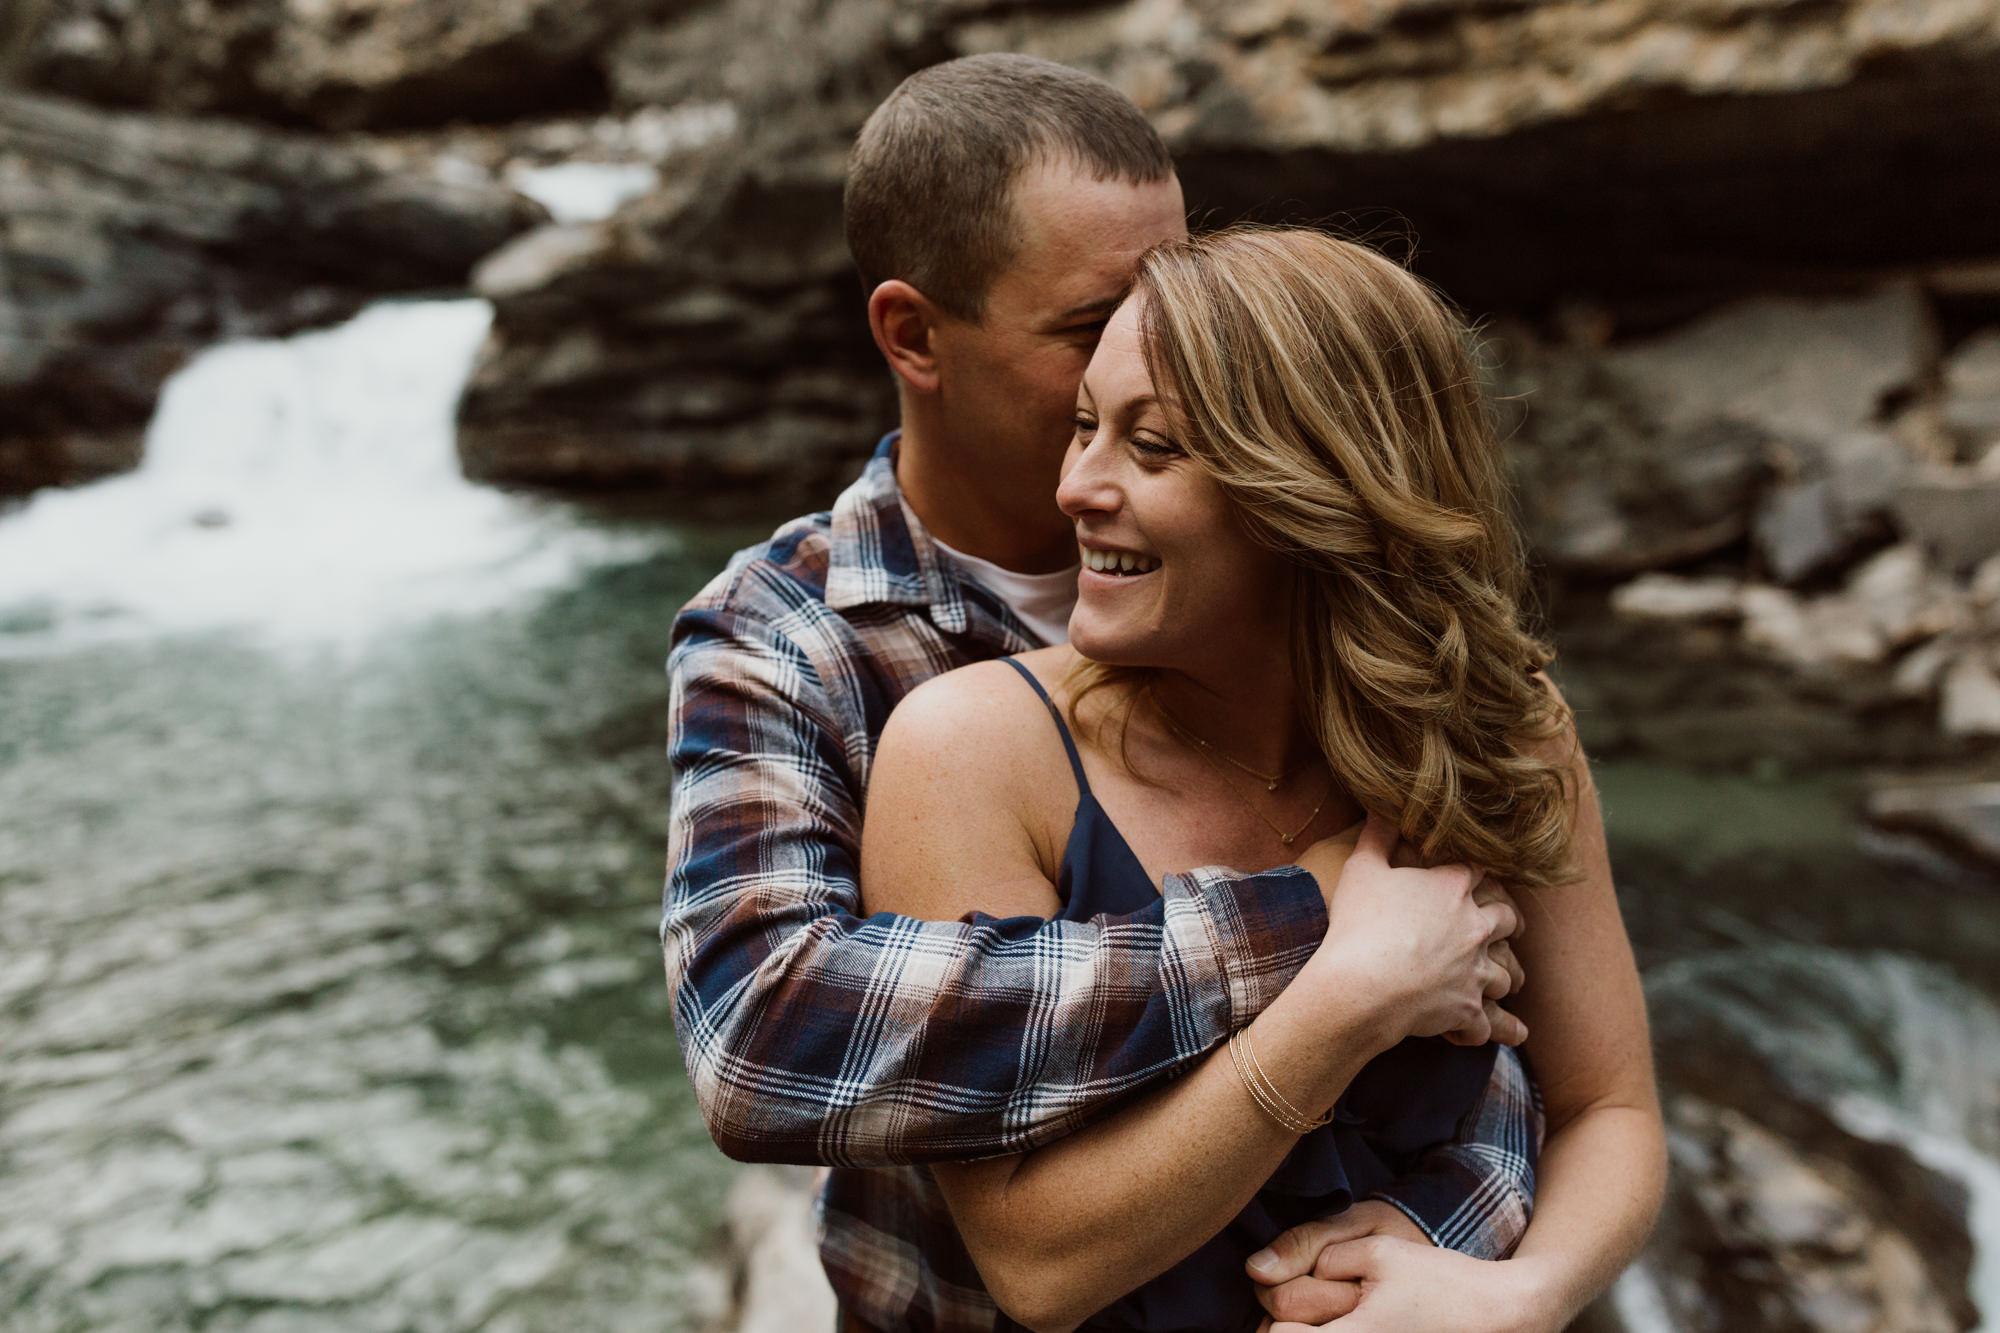 banff-engagements-destination-wedding-photographer-23.jpg